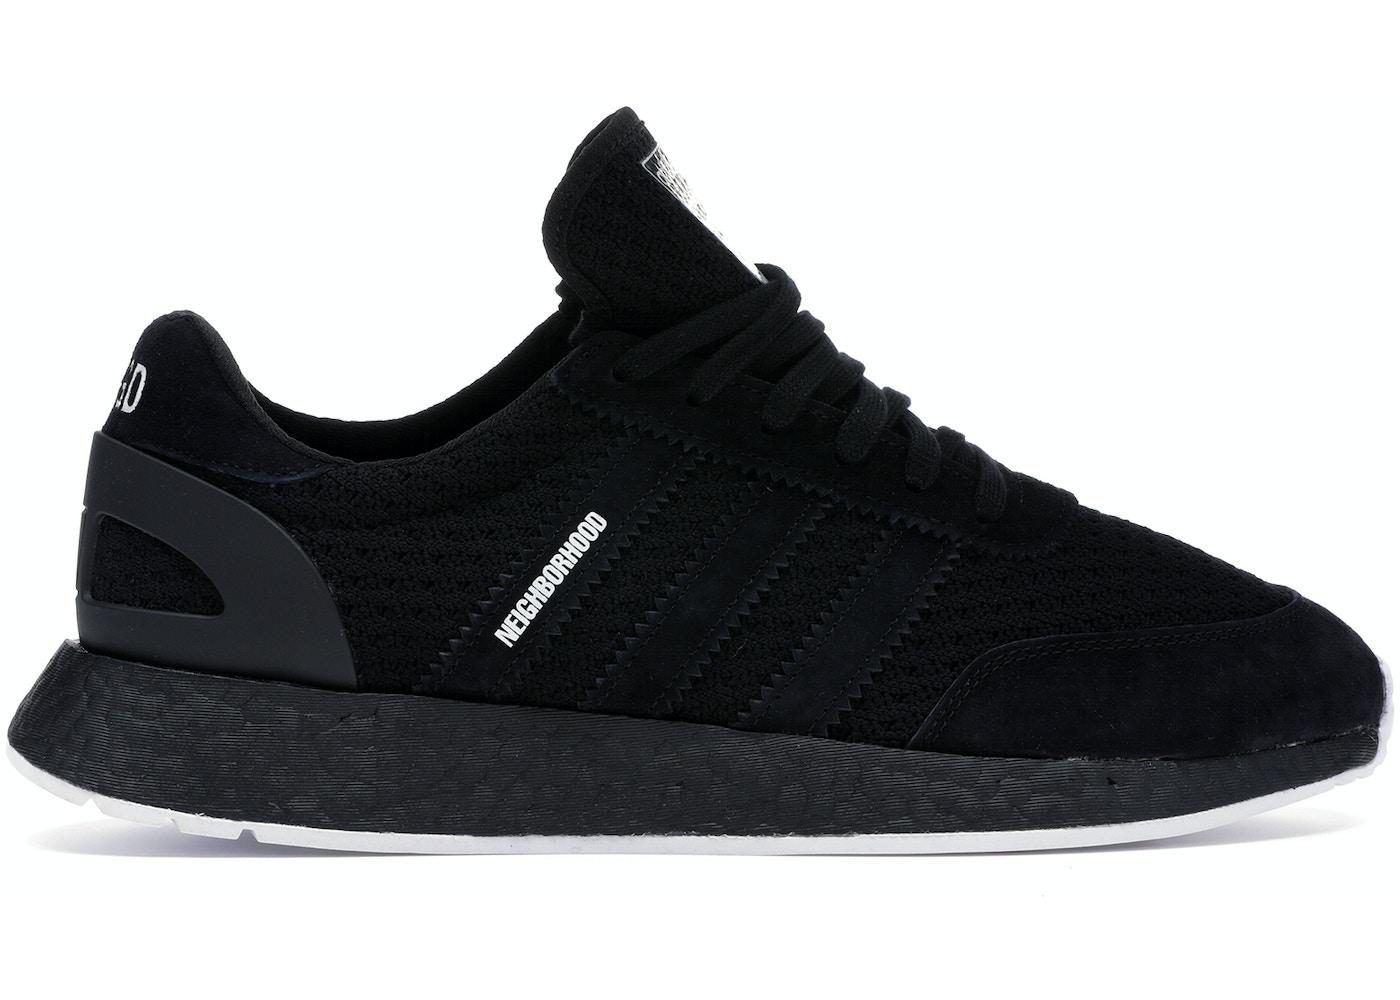 arrives ec242 78561 adidas I-5923 Neighborhood Core Black - DA8838